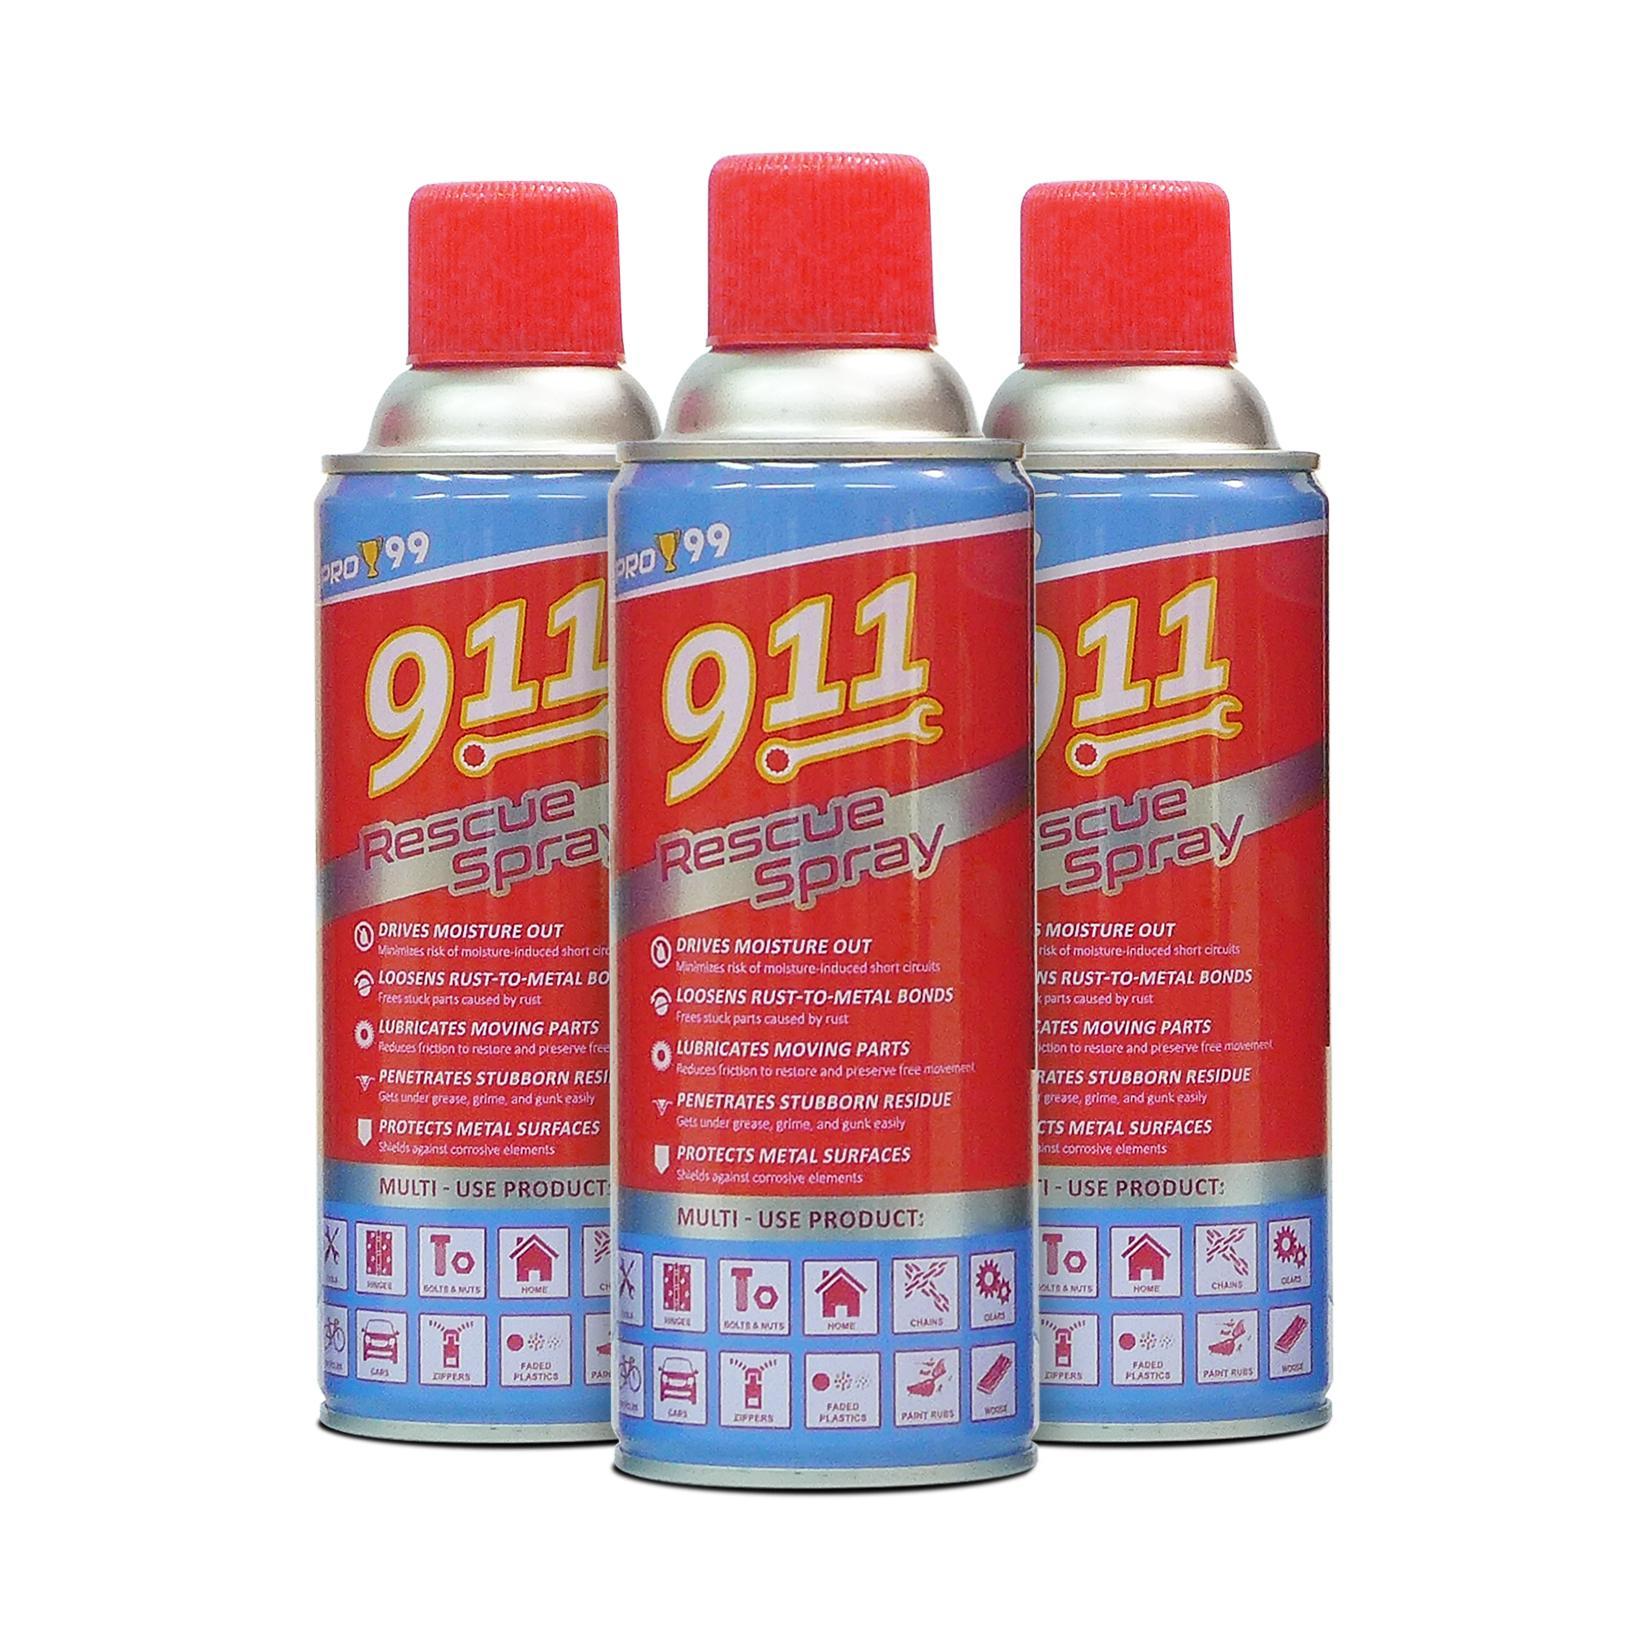 PRO-99 911 Rescue Spray 450ml PLRS-1143-45 (Pack of 3)